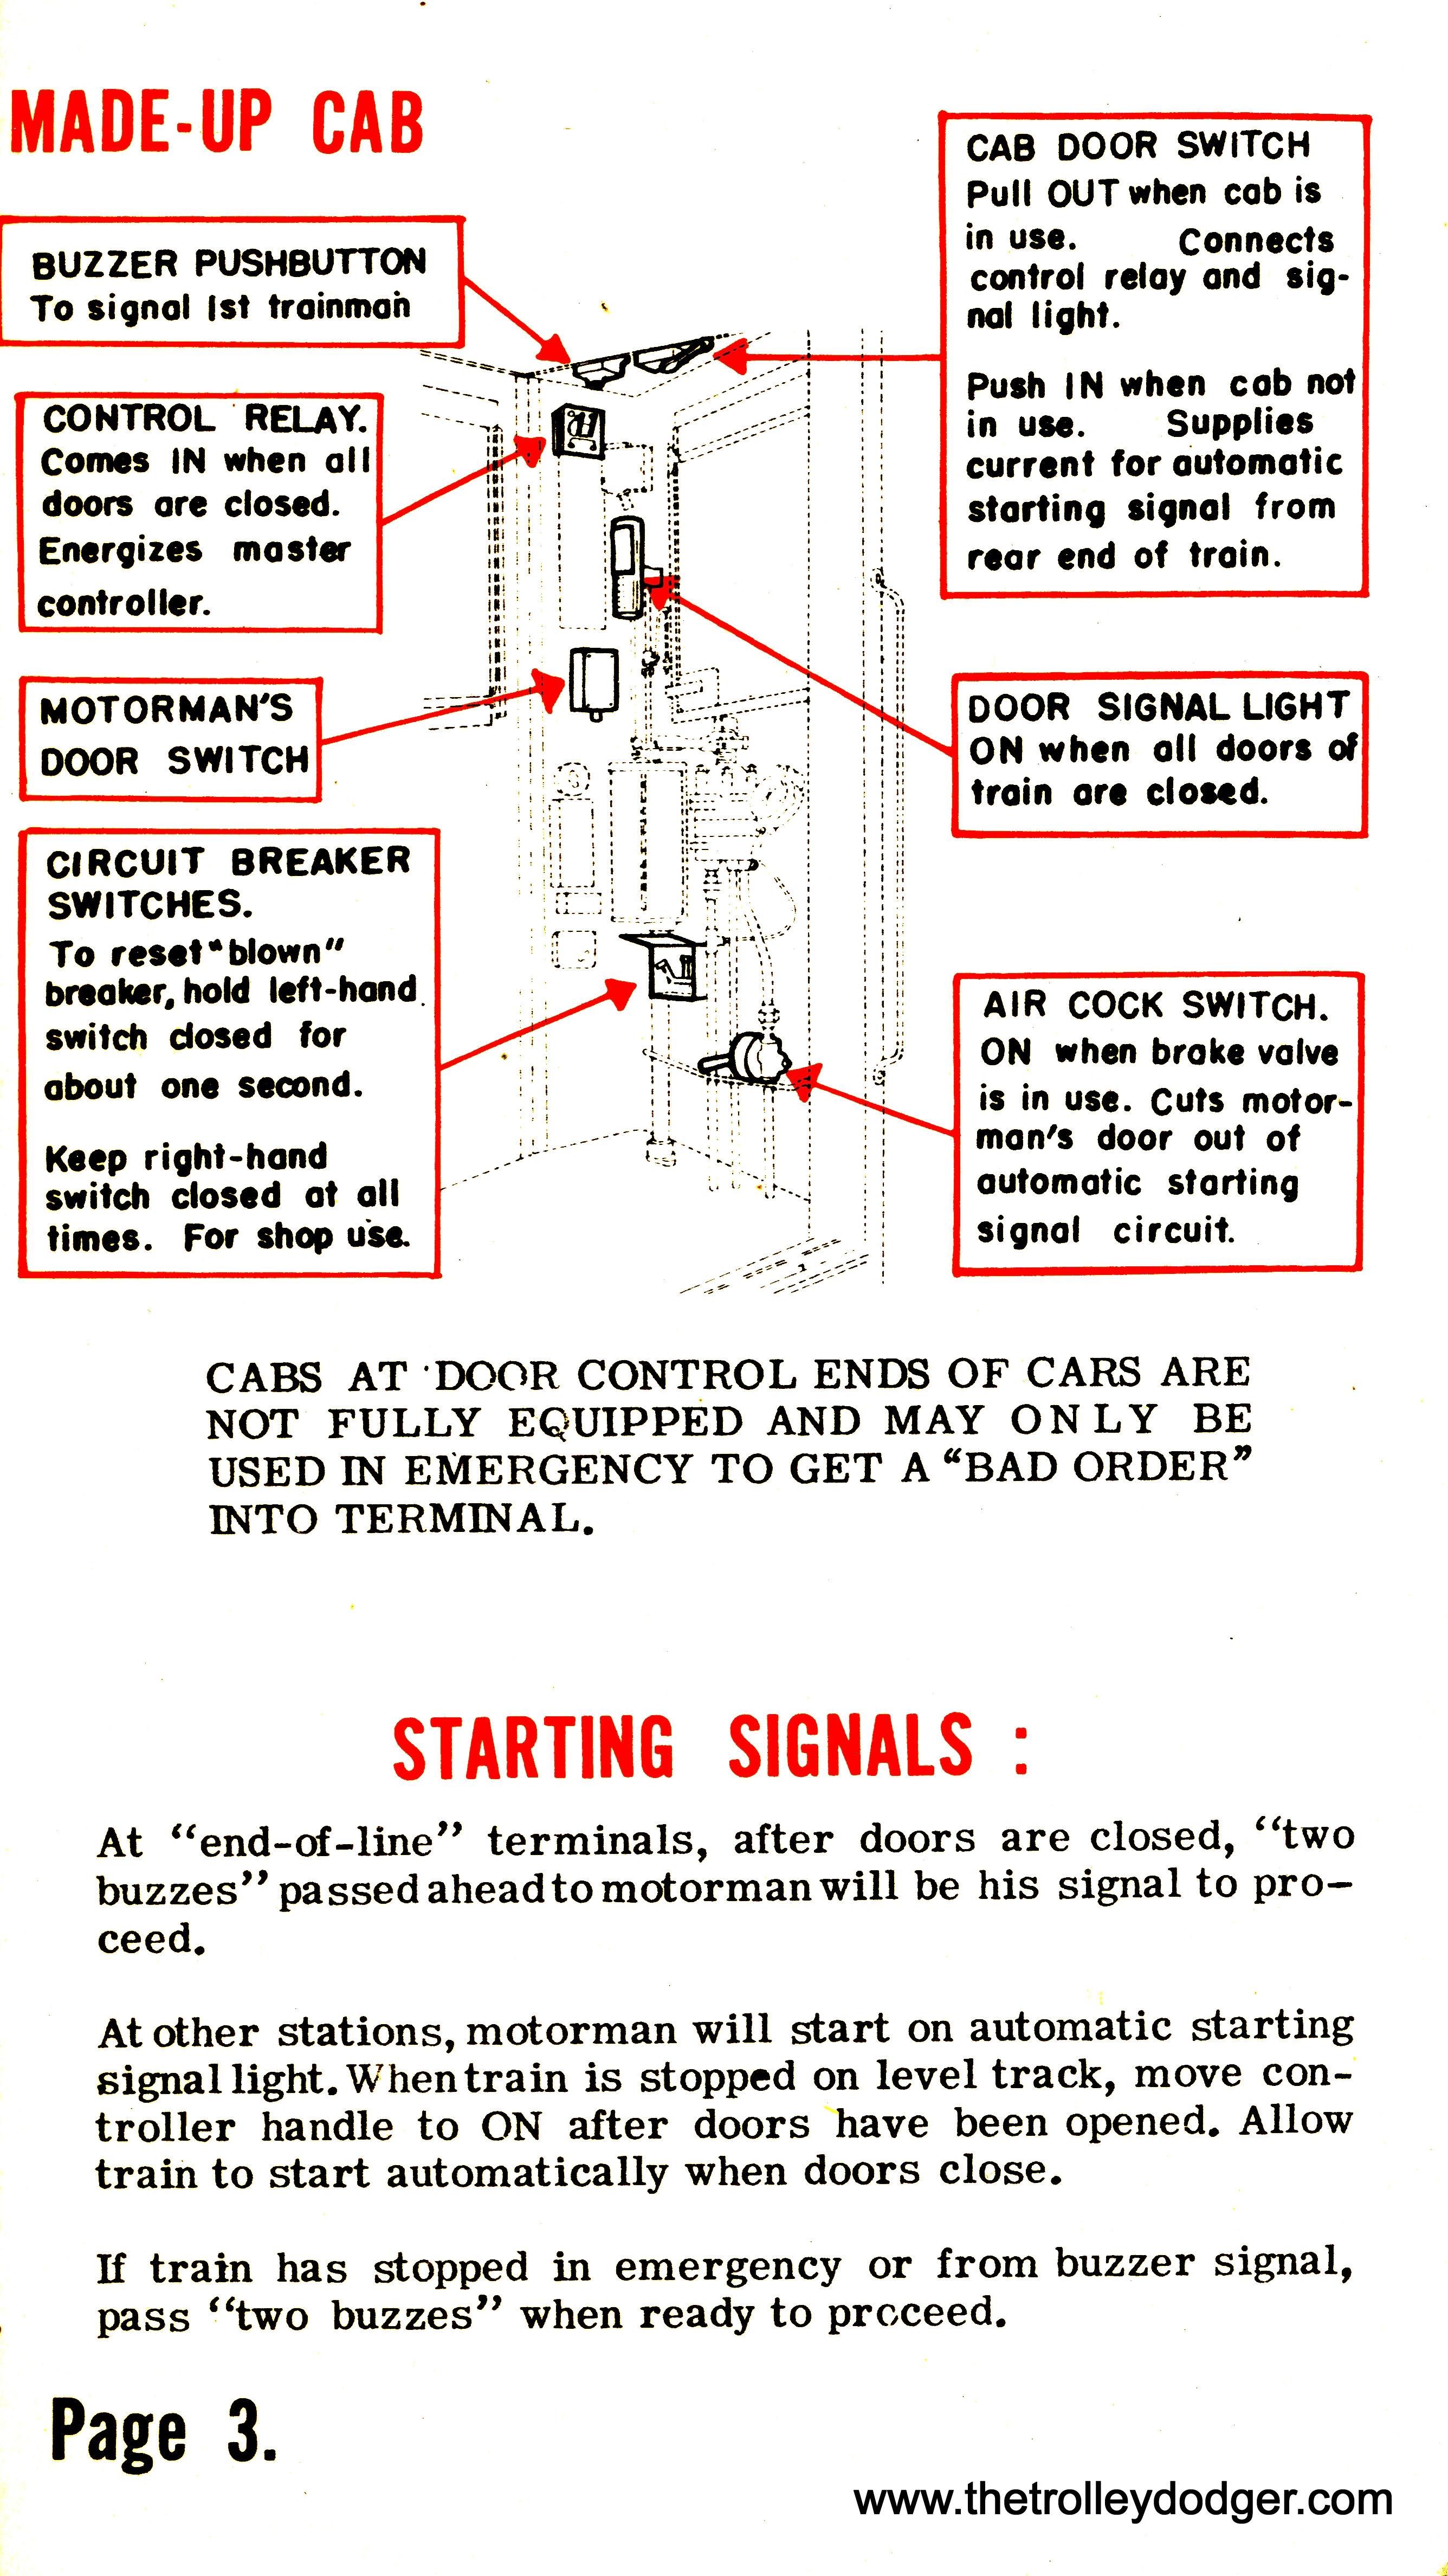 Amazing Nutone La501cy 1 Doorbell Wiring Diagrams Image - Wiring ...